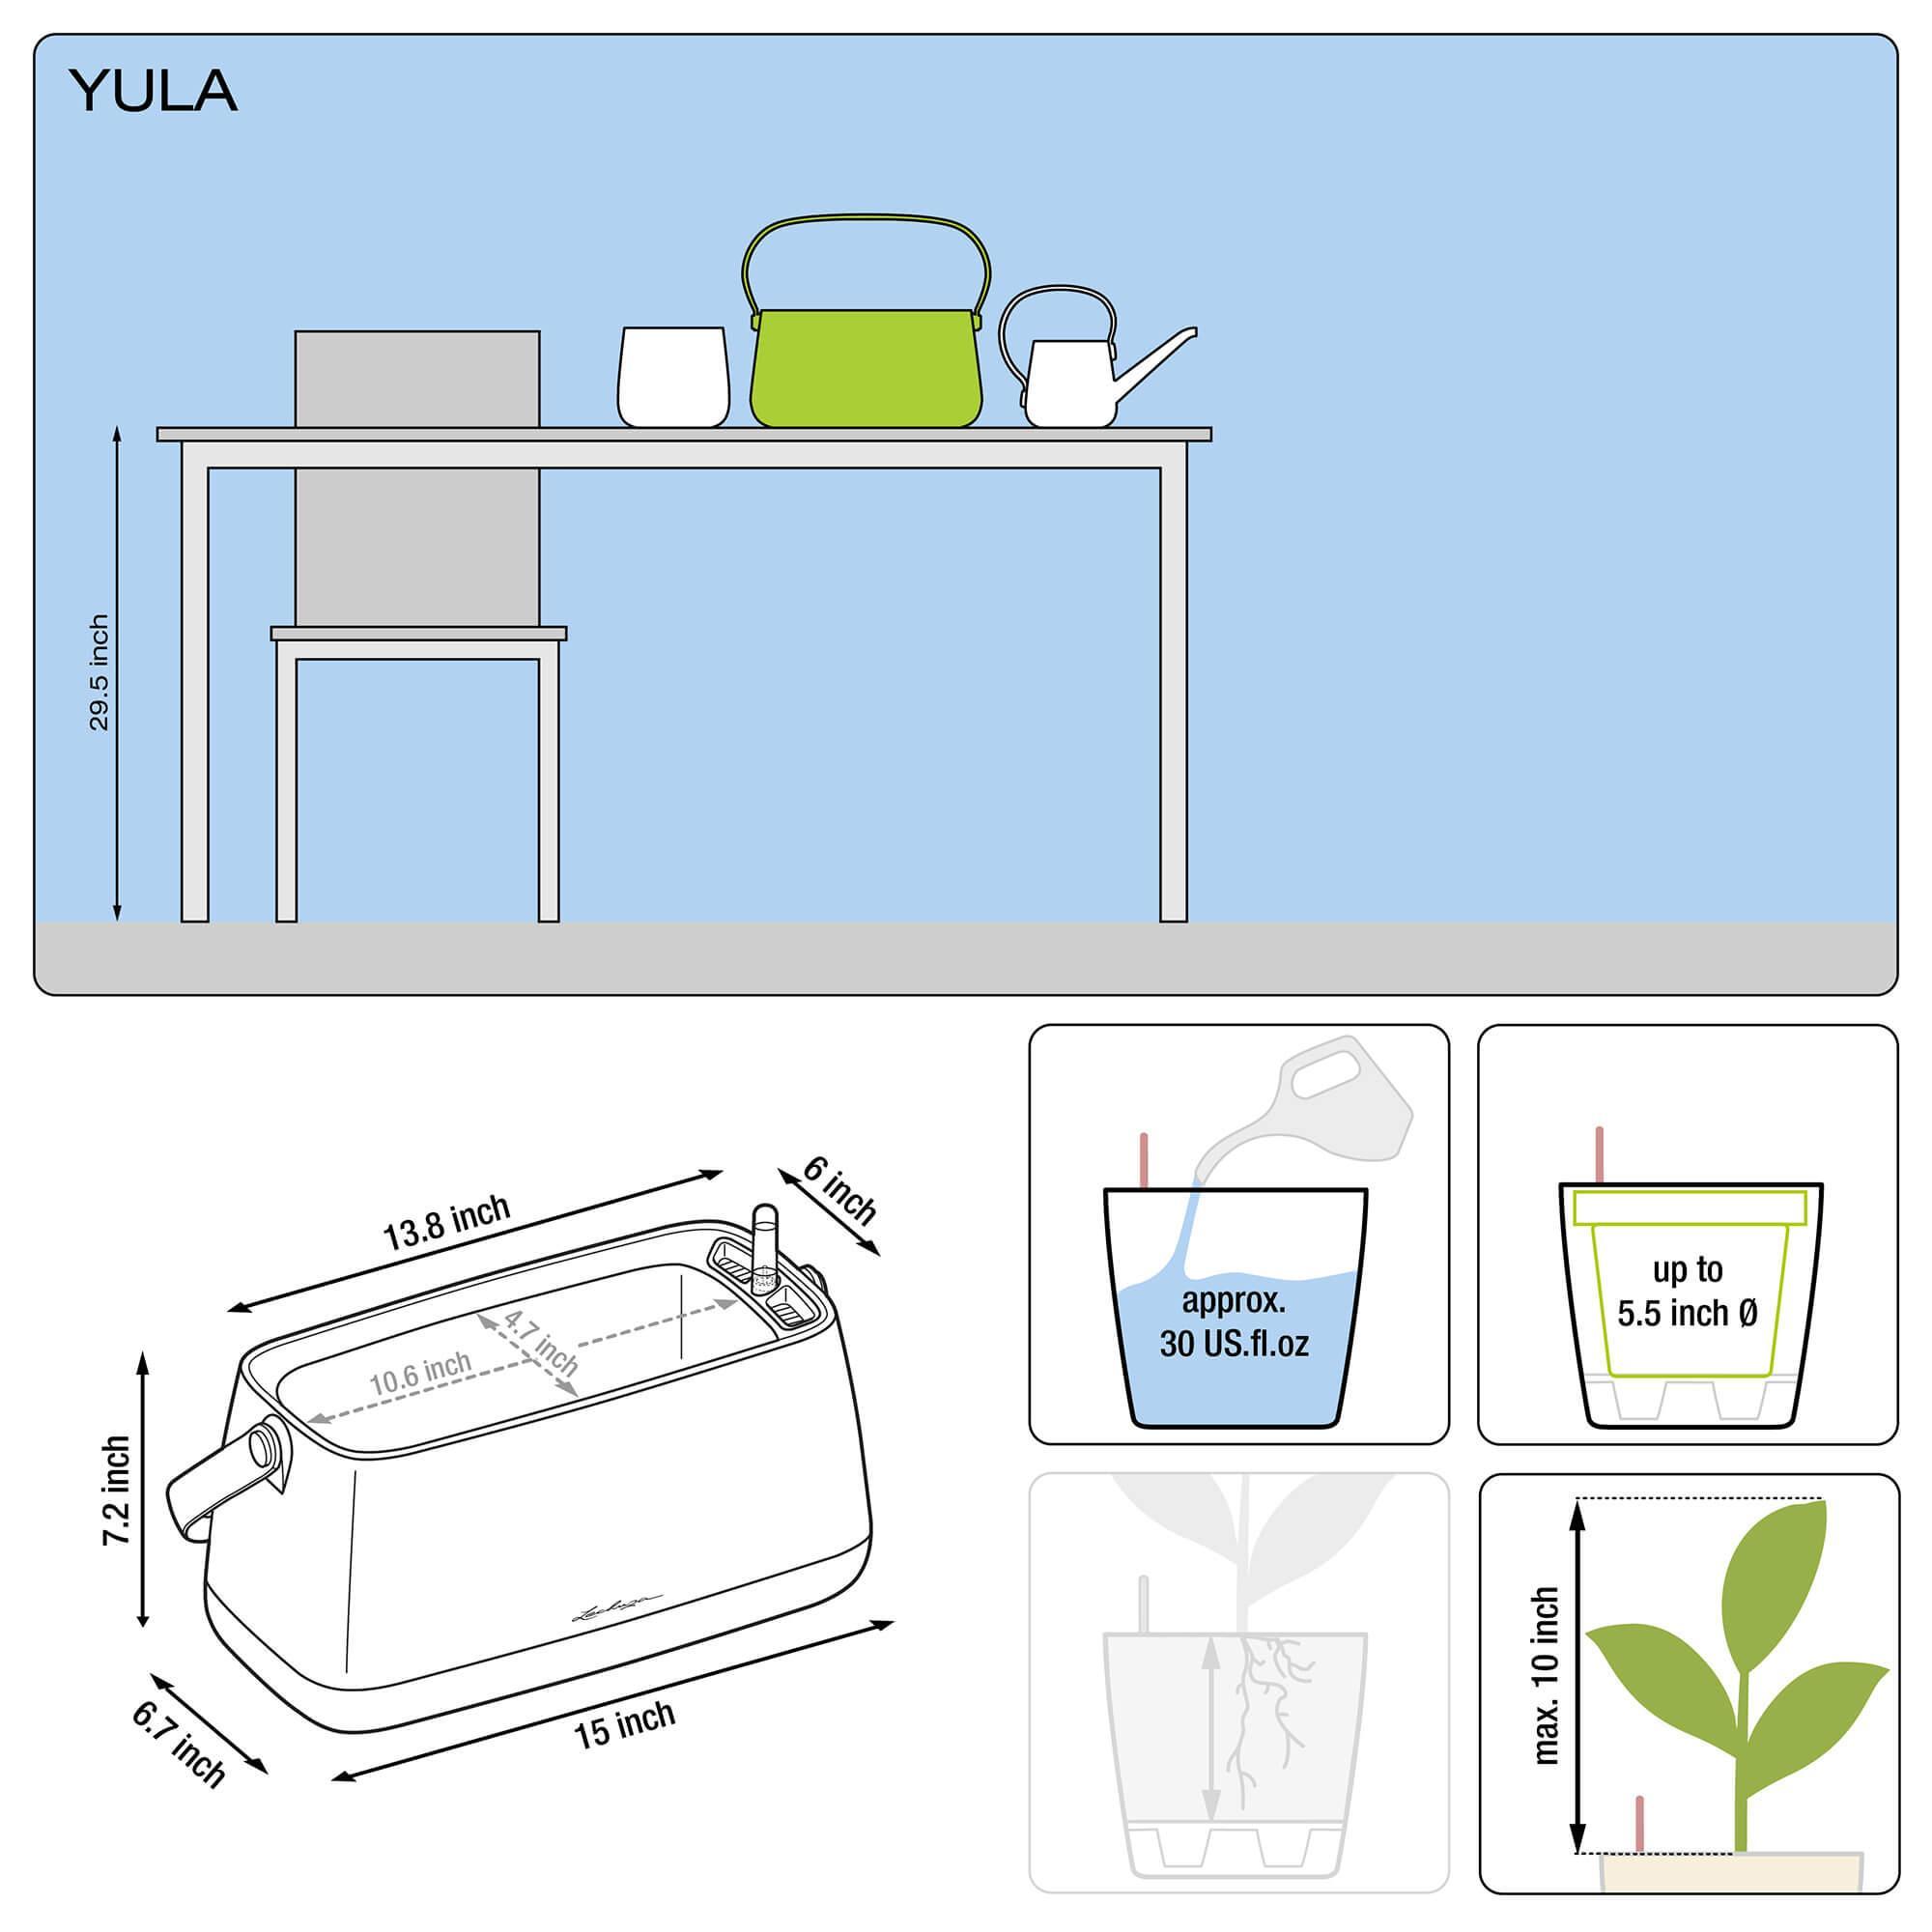 le_yula-pflanztasche_product_addi_nz_us